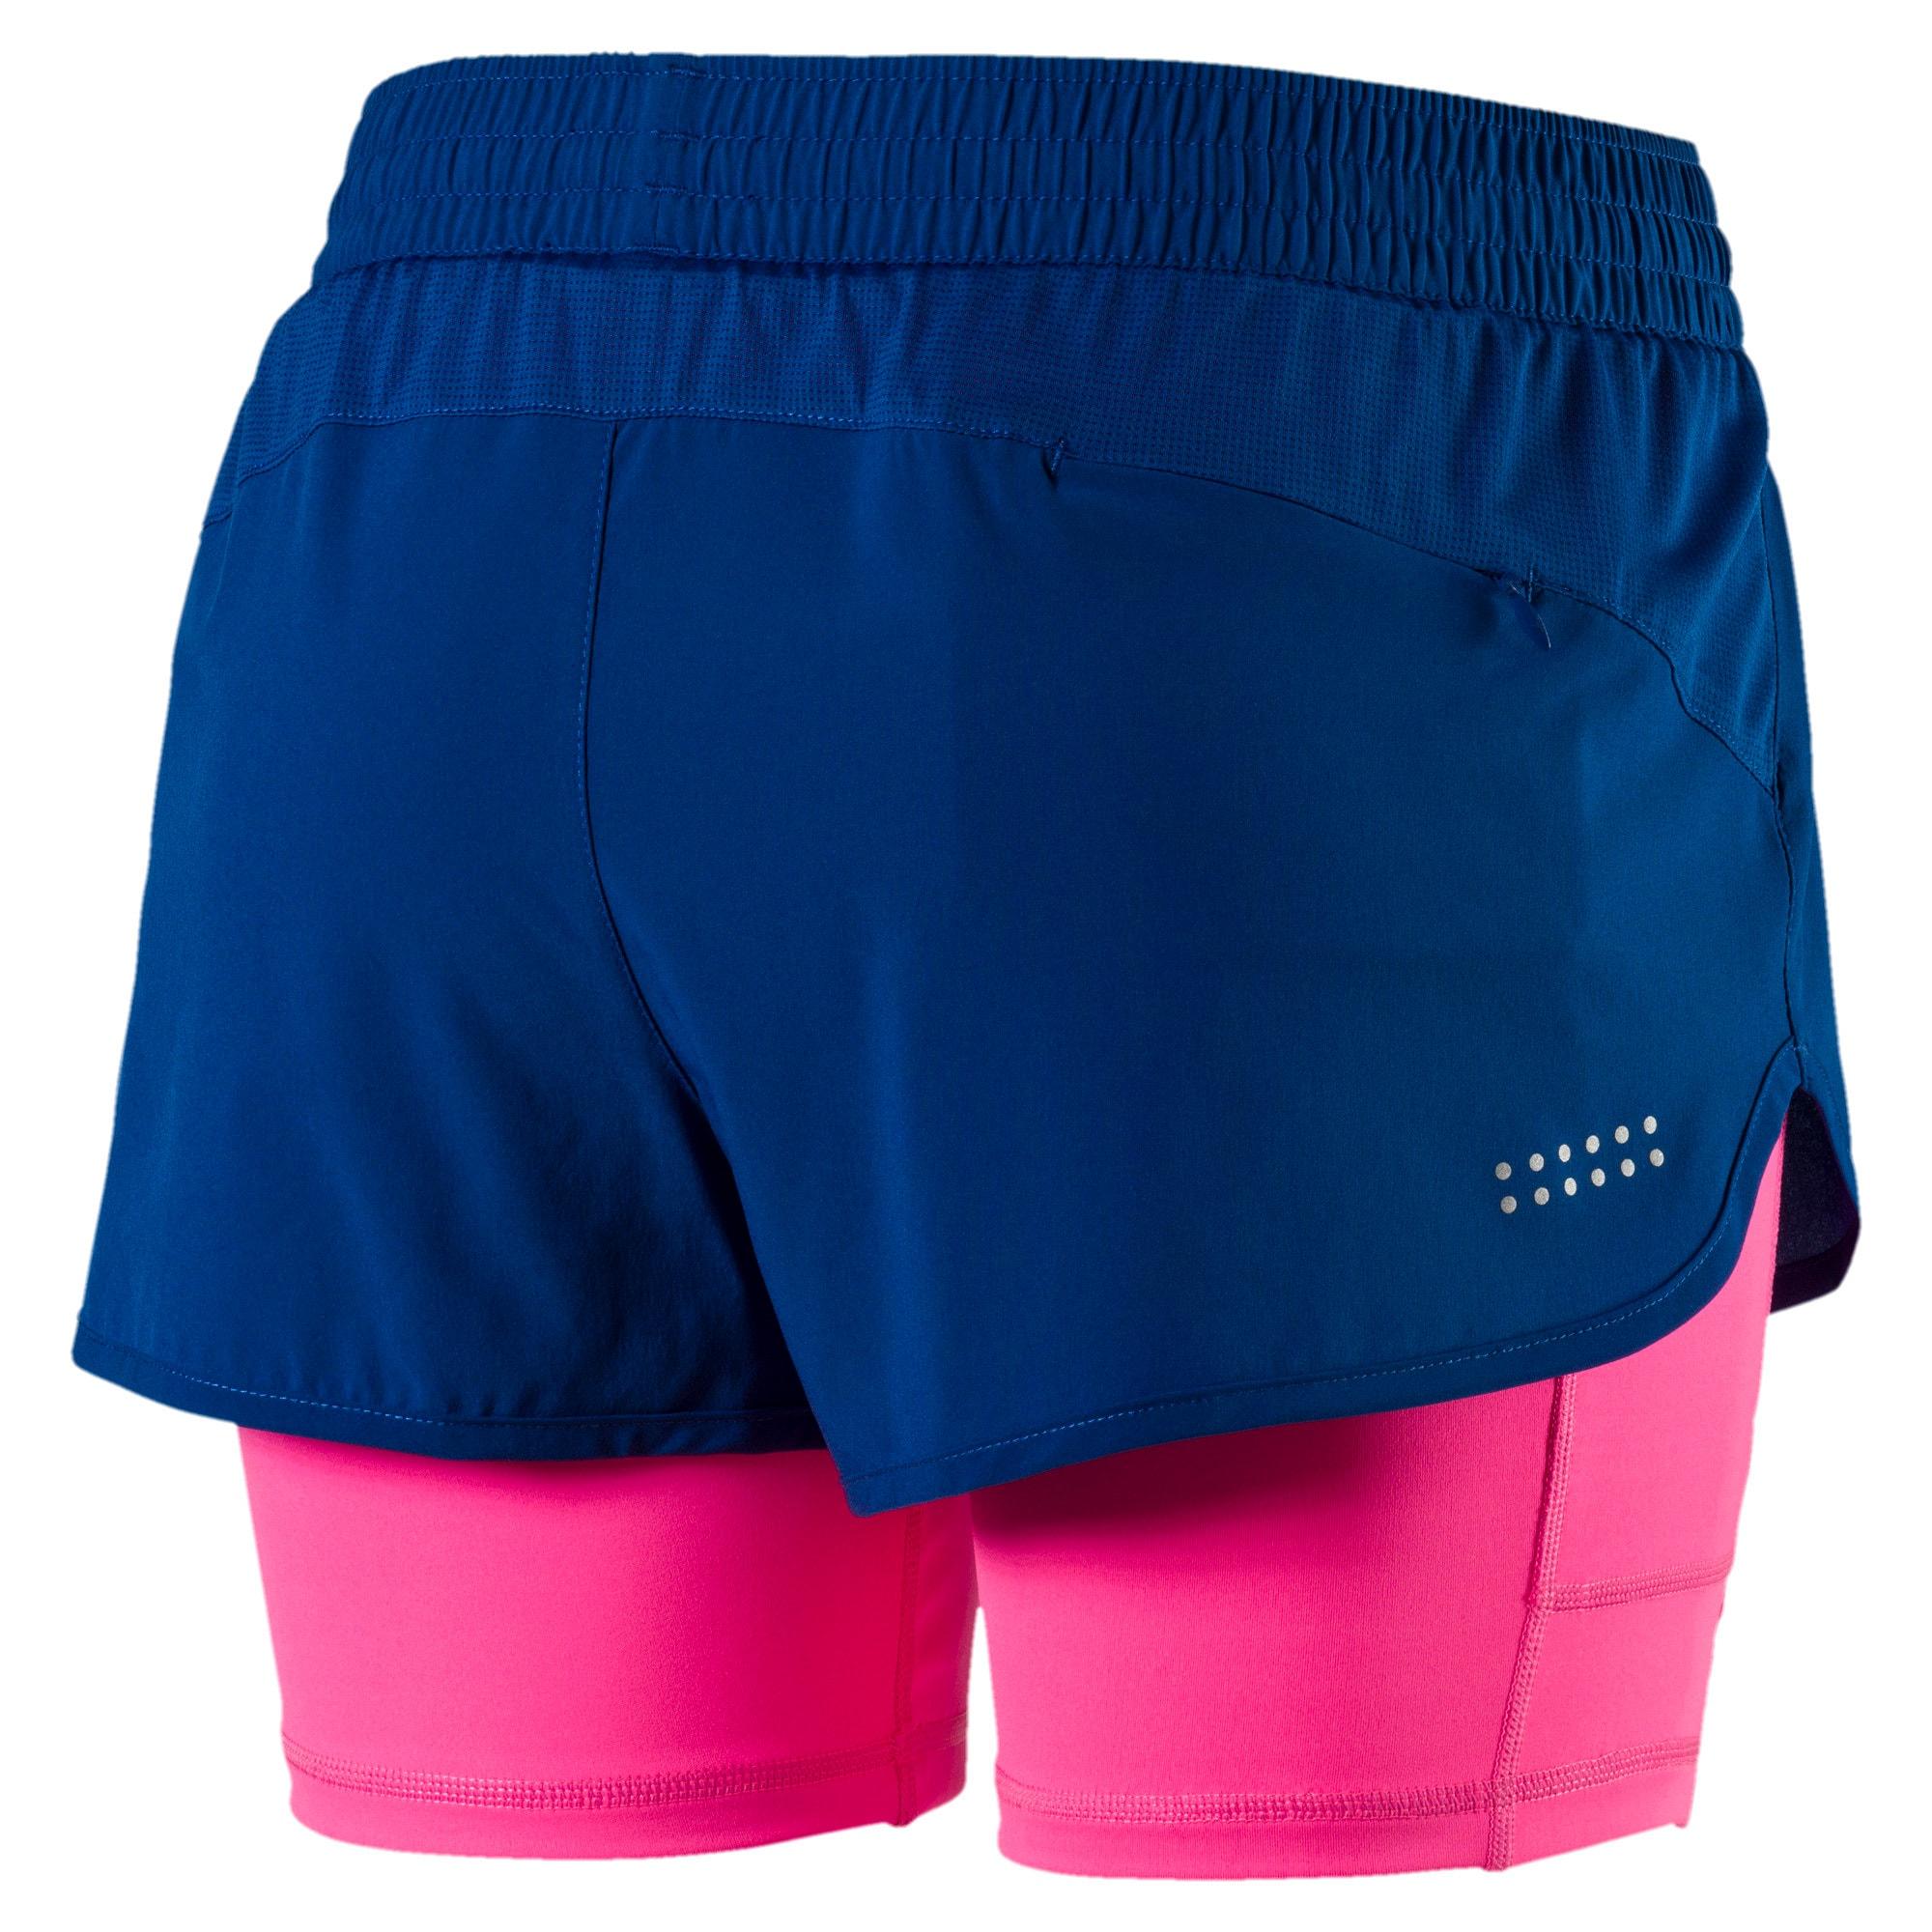 Thumbnail 5 of Running Women's Blast 2 in 1 Shorts, TRUE BLUE-KNOCKOUT PINK, medium-IND